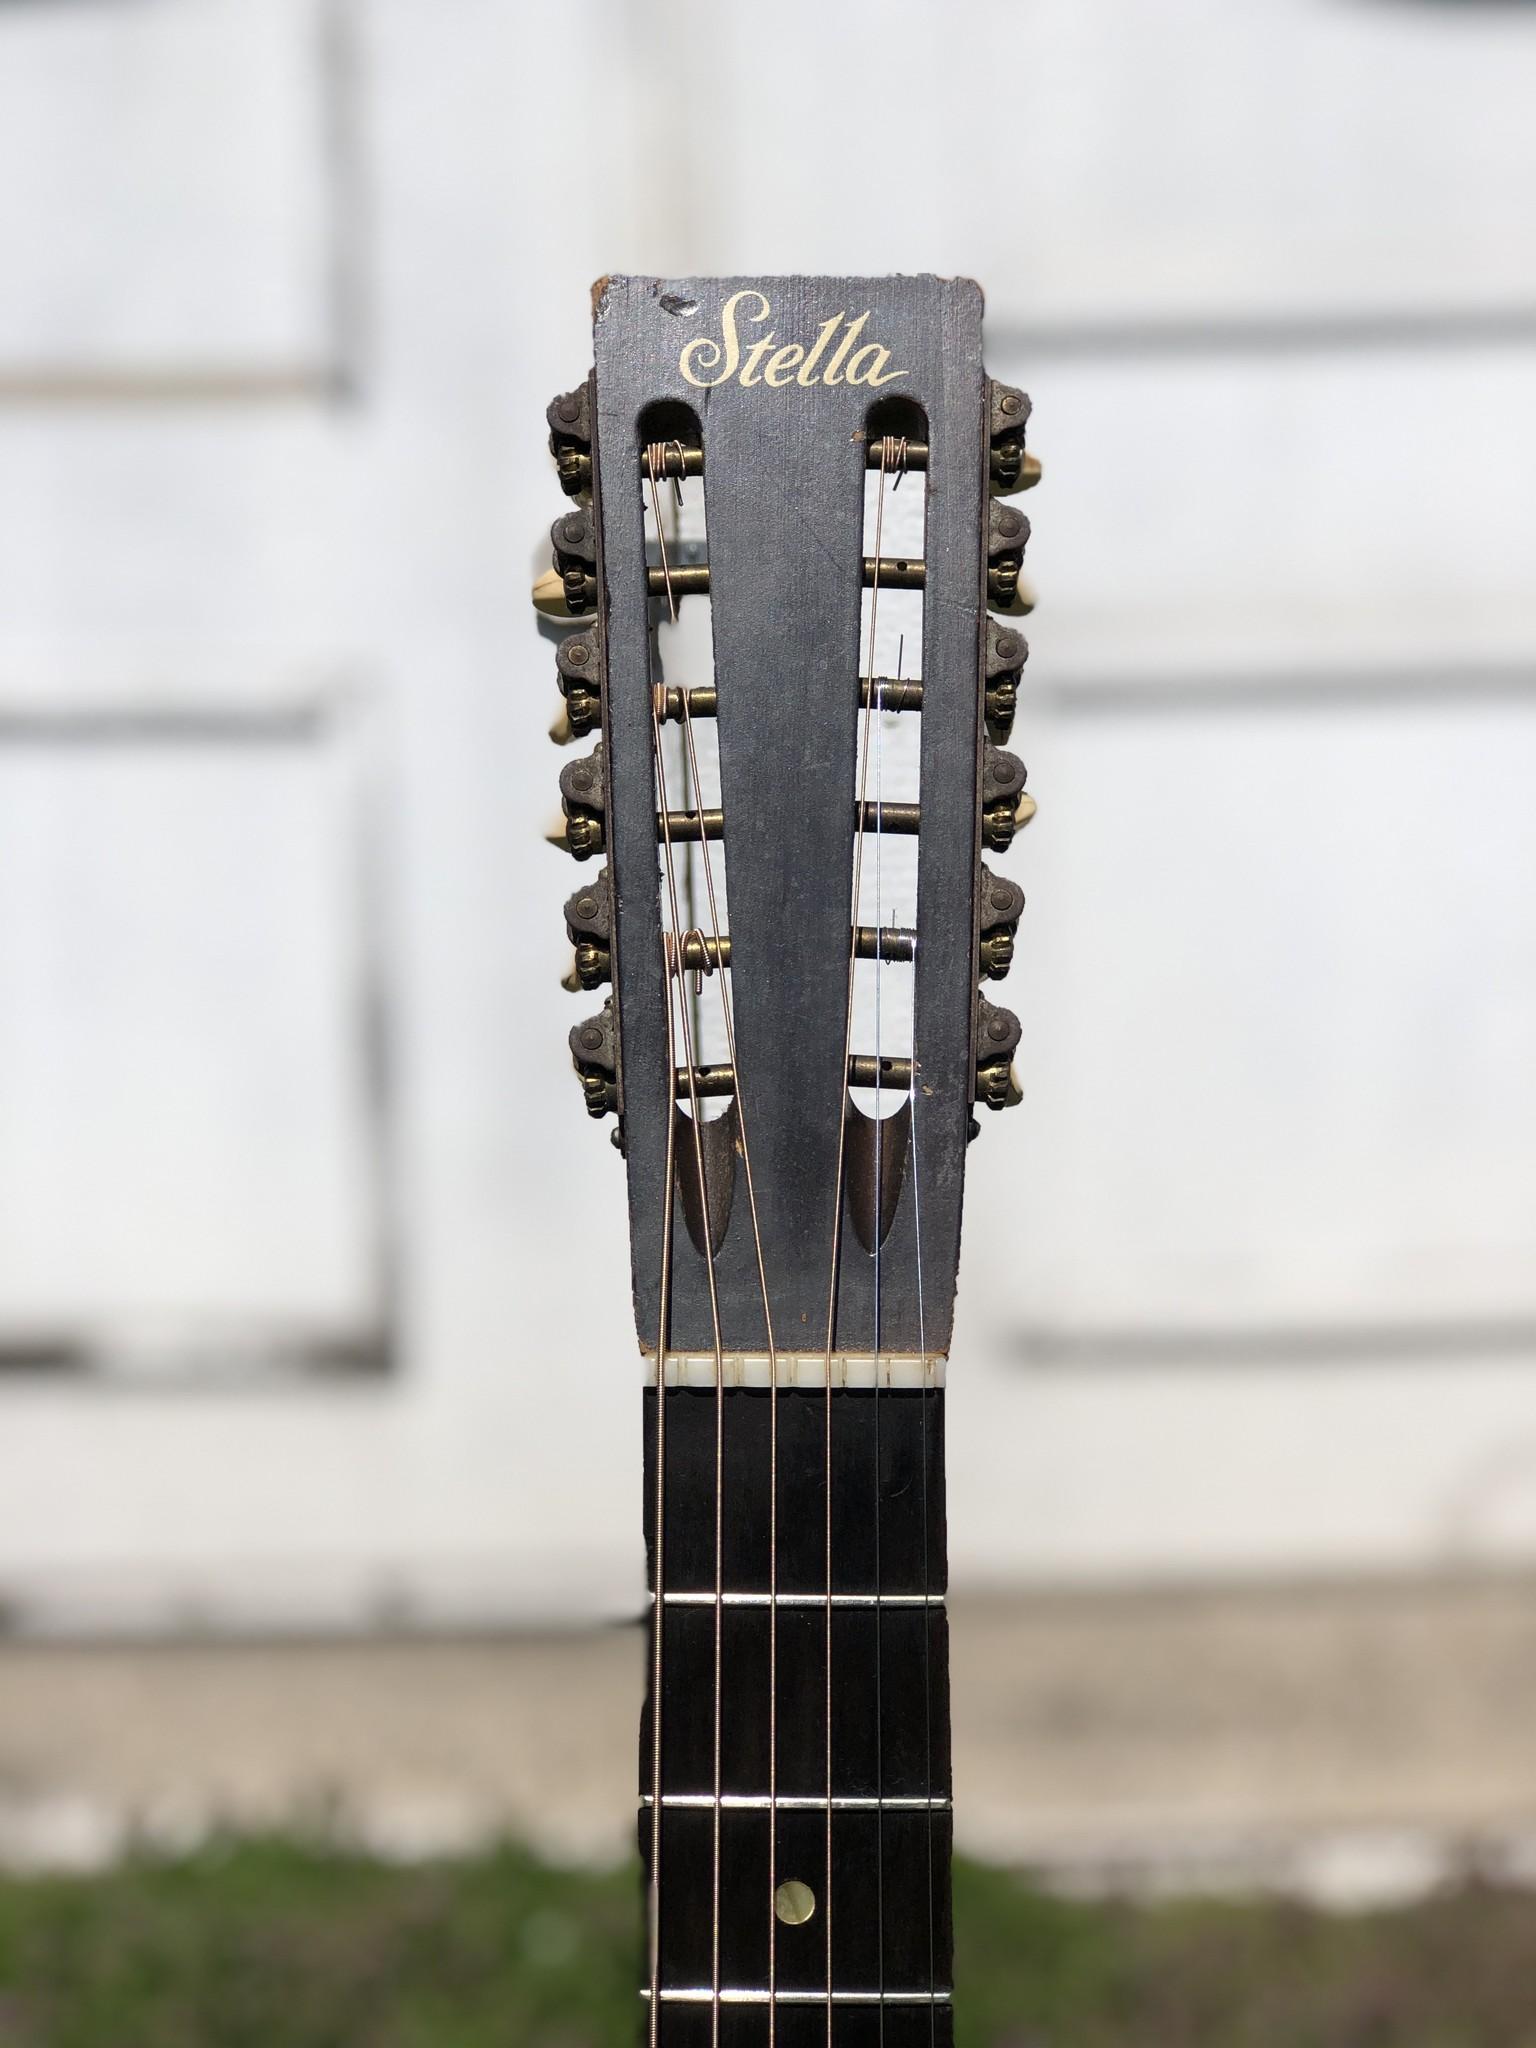 1960s Stella 12-string (strung up for 6 string) 7164 H922-6